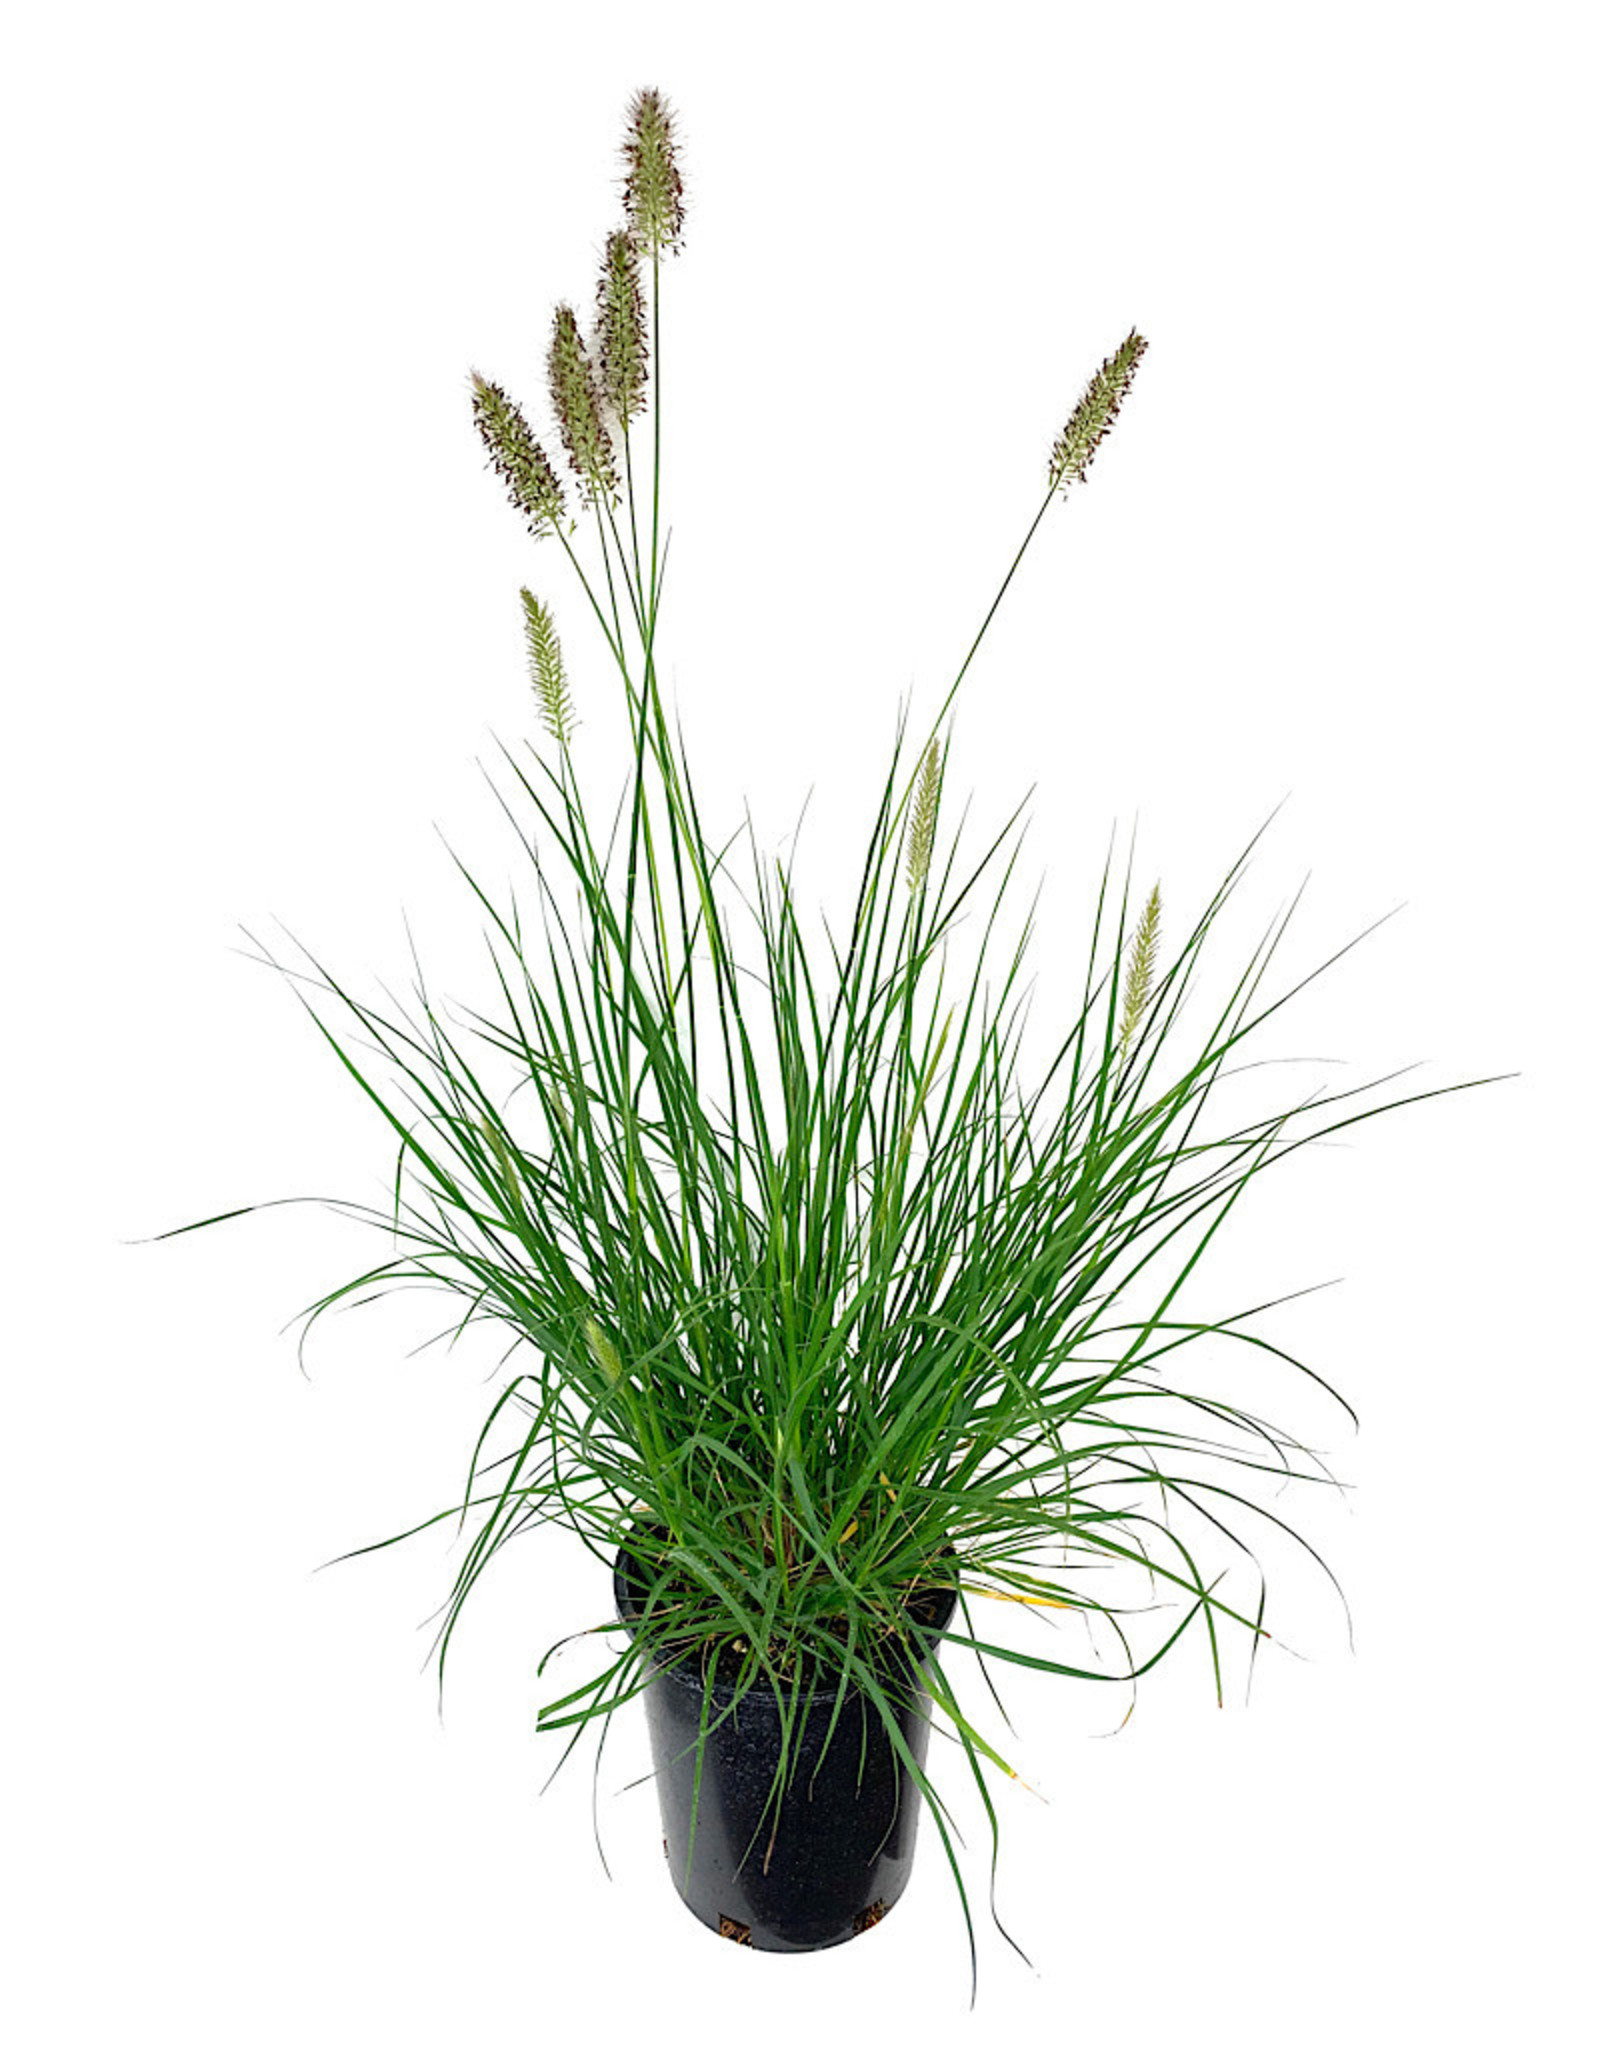 Pennisetum alopecuroides 'Hameln' 1 Gallon